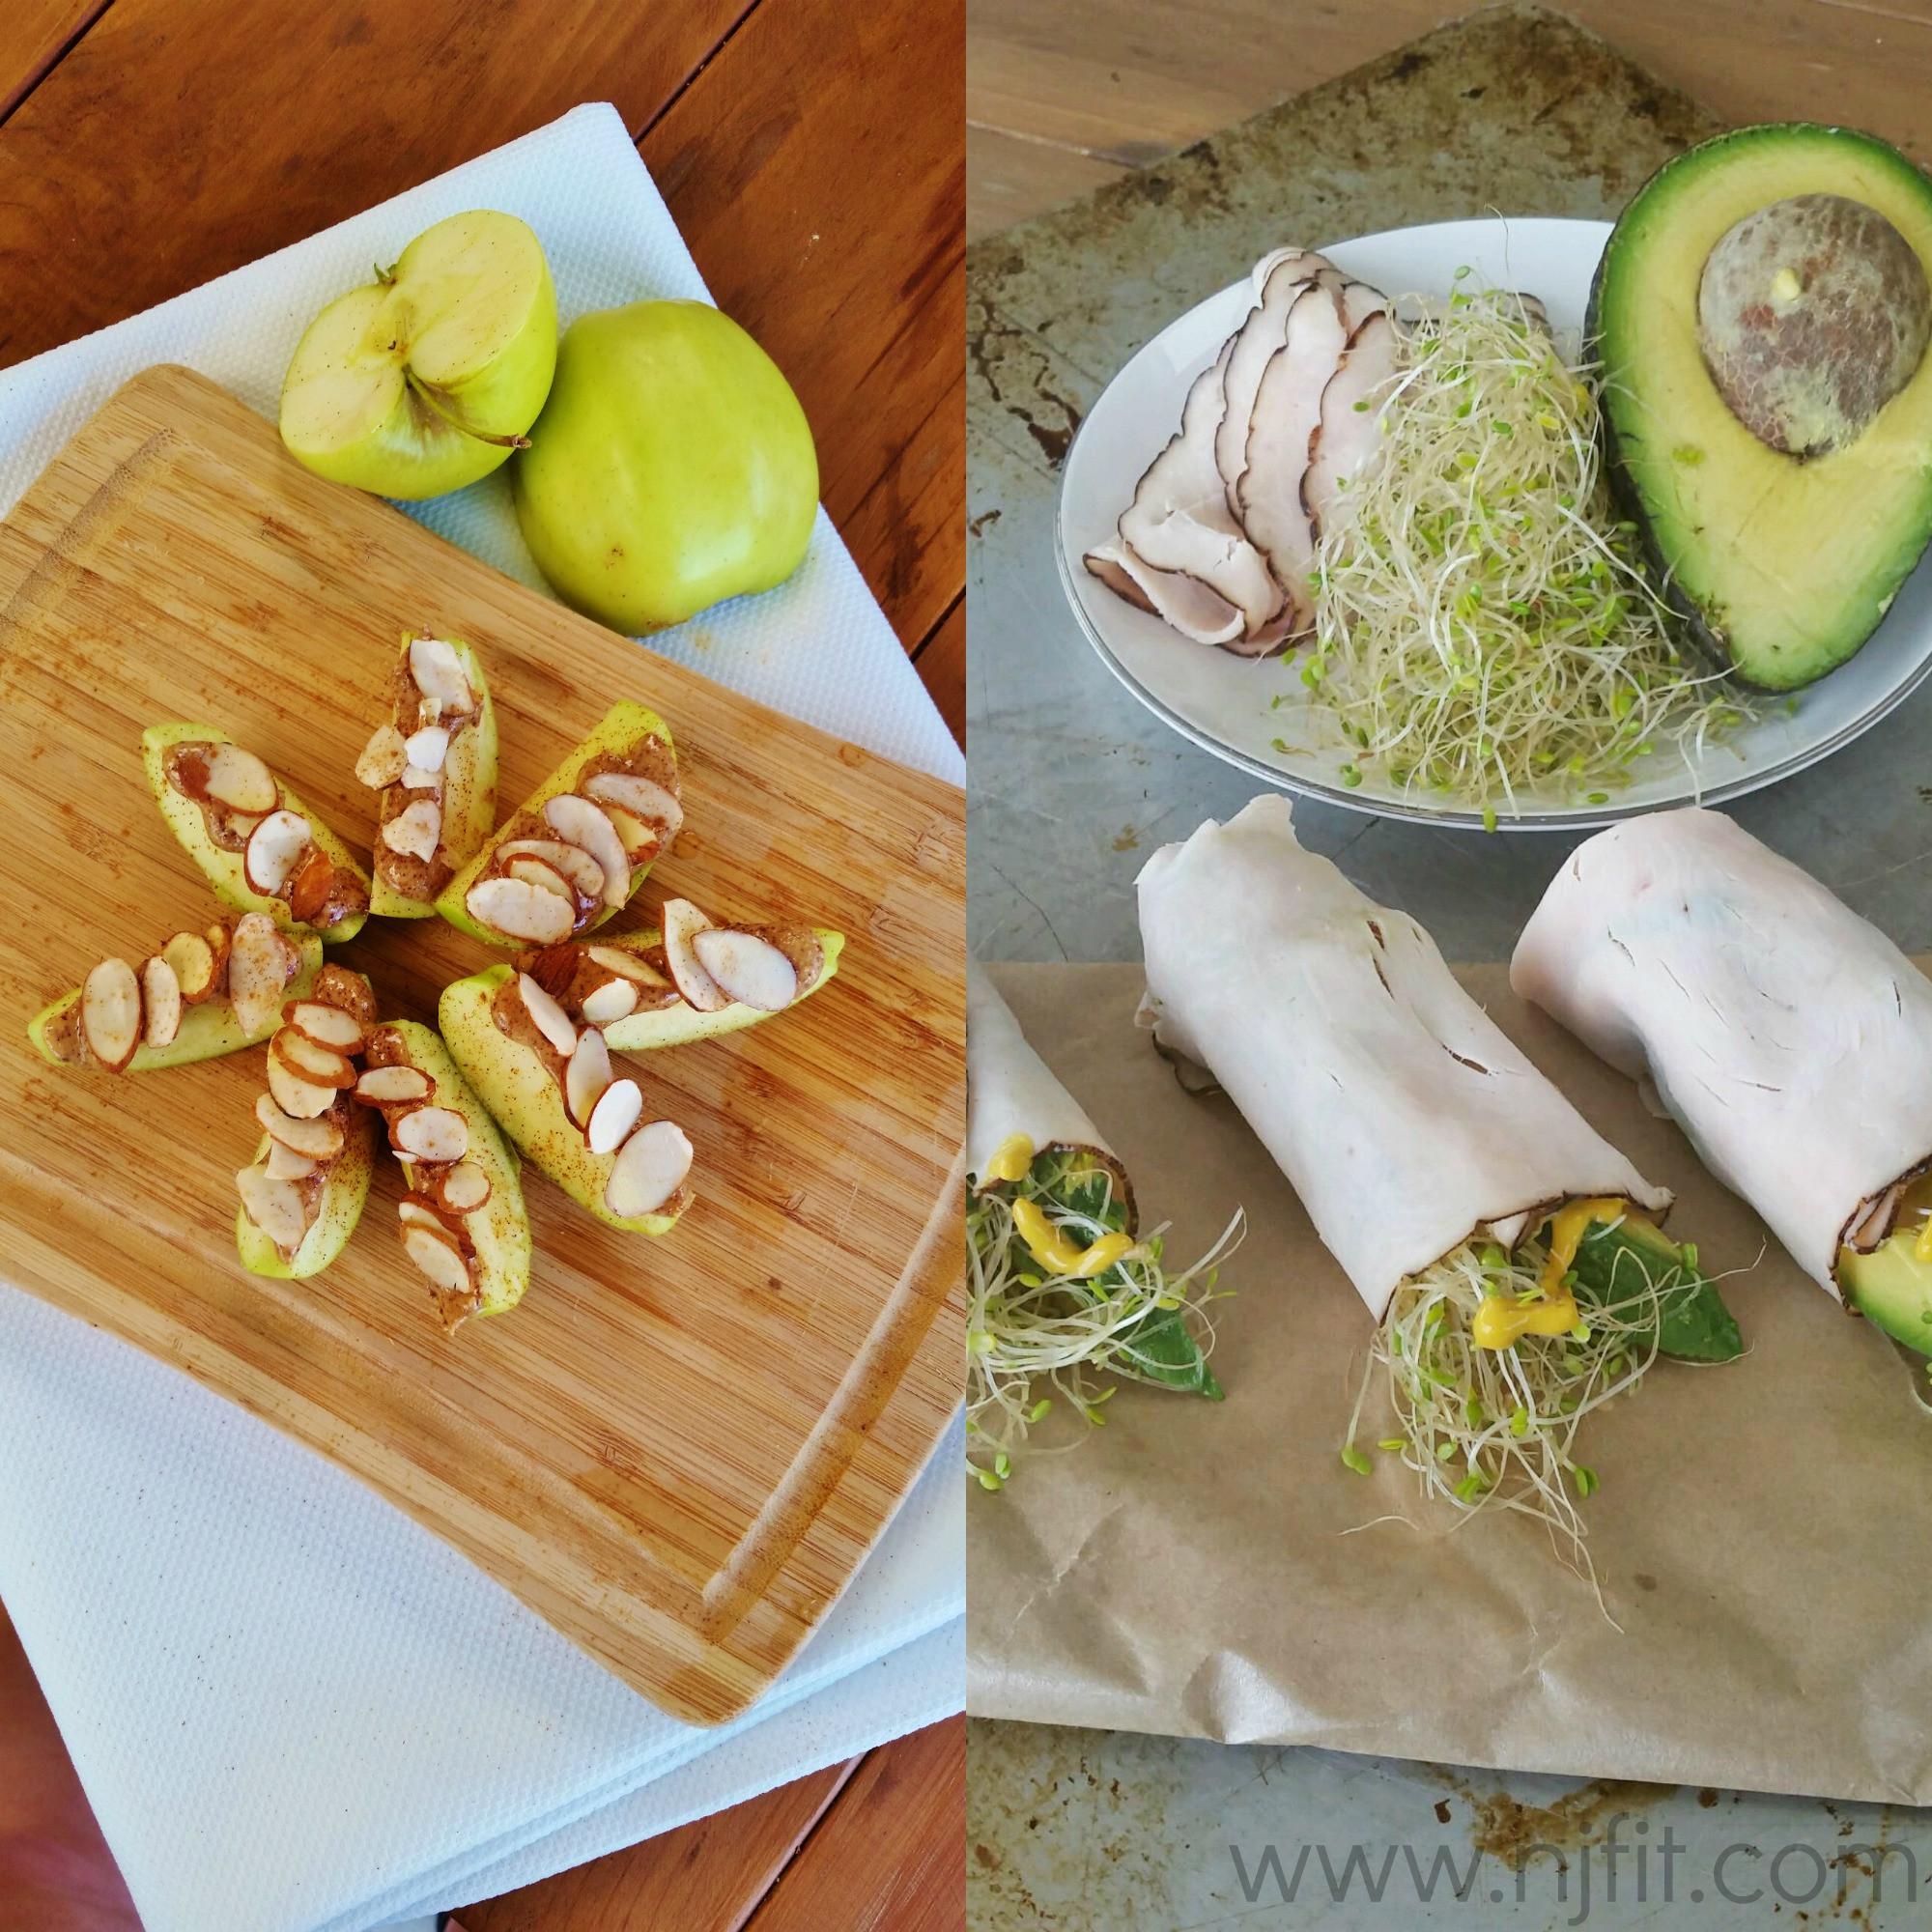 Quick Healthy Snacks  Quick healthy snacks 2 Natalie Jill Fitness